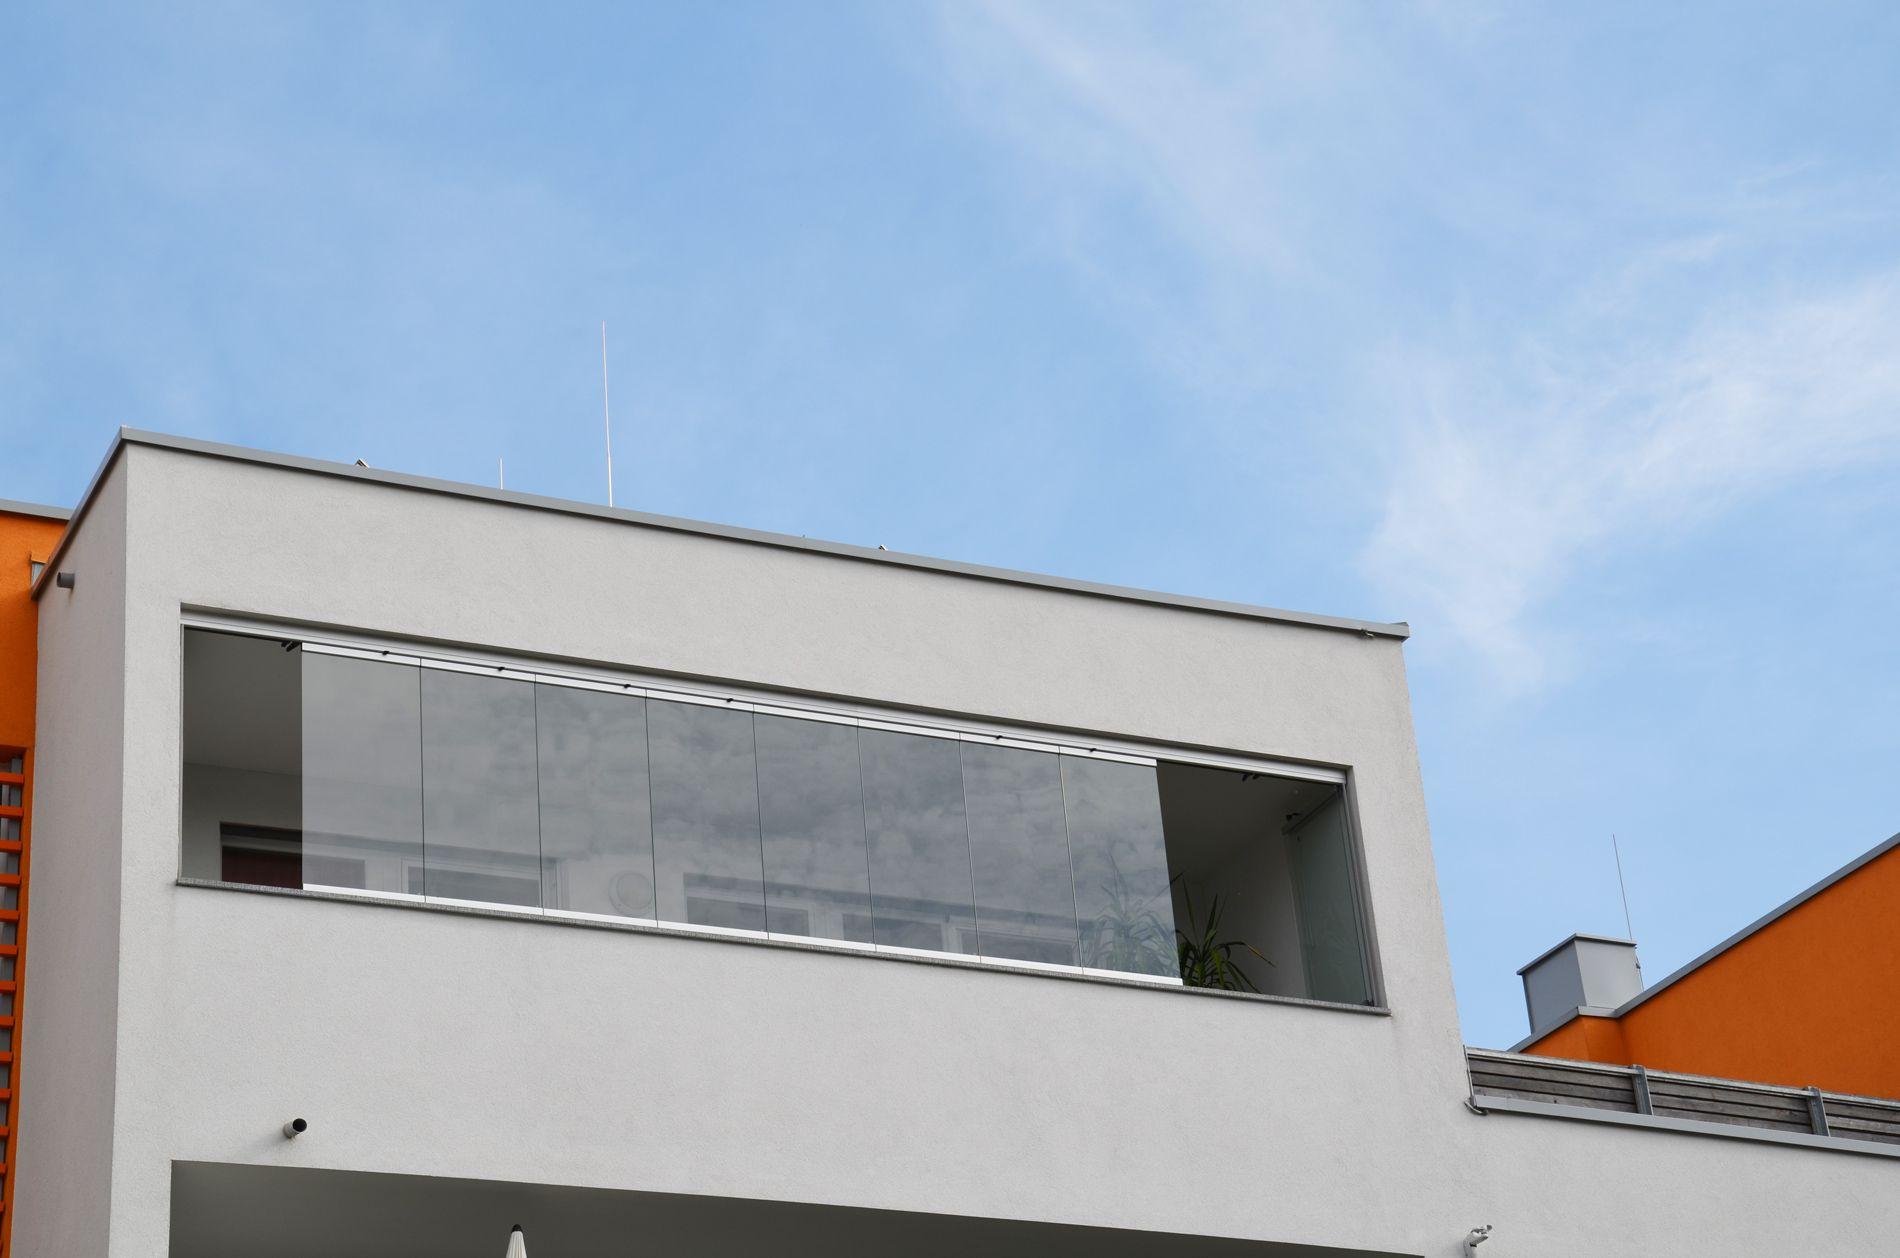 Faltfenster Wintergarten ~ Faltfenster preis verglasungen balkon terrasse